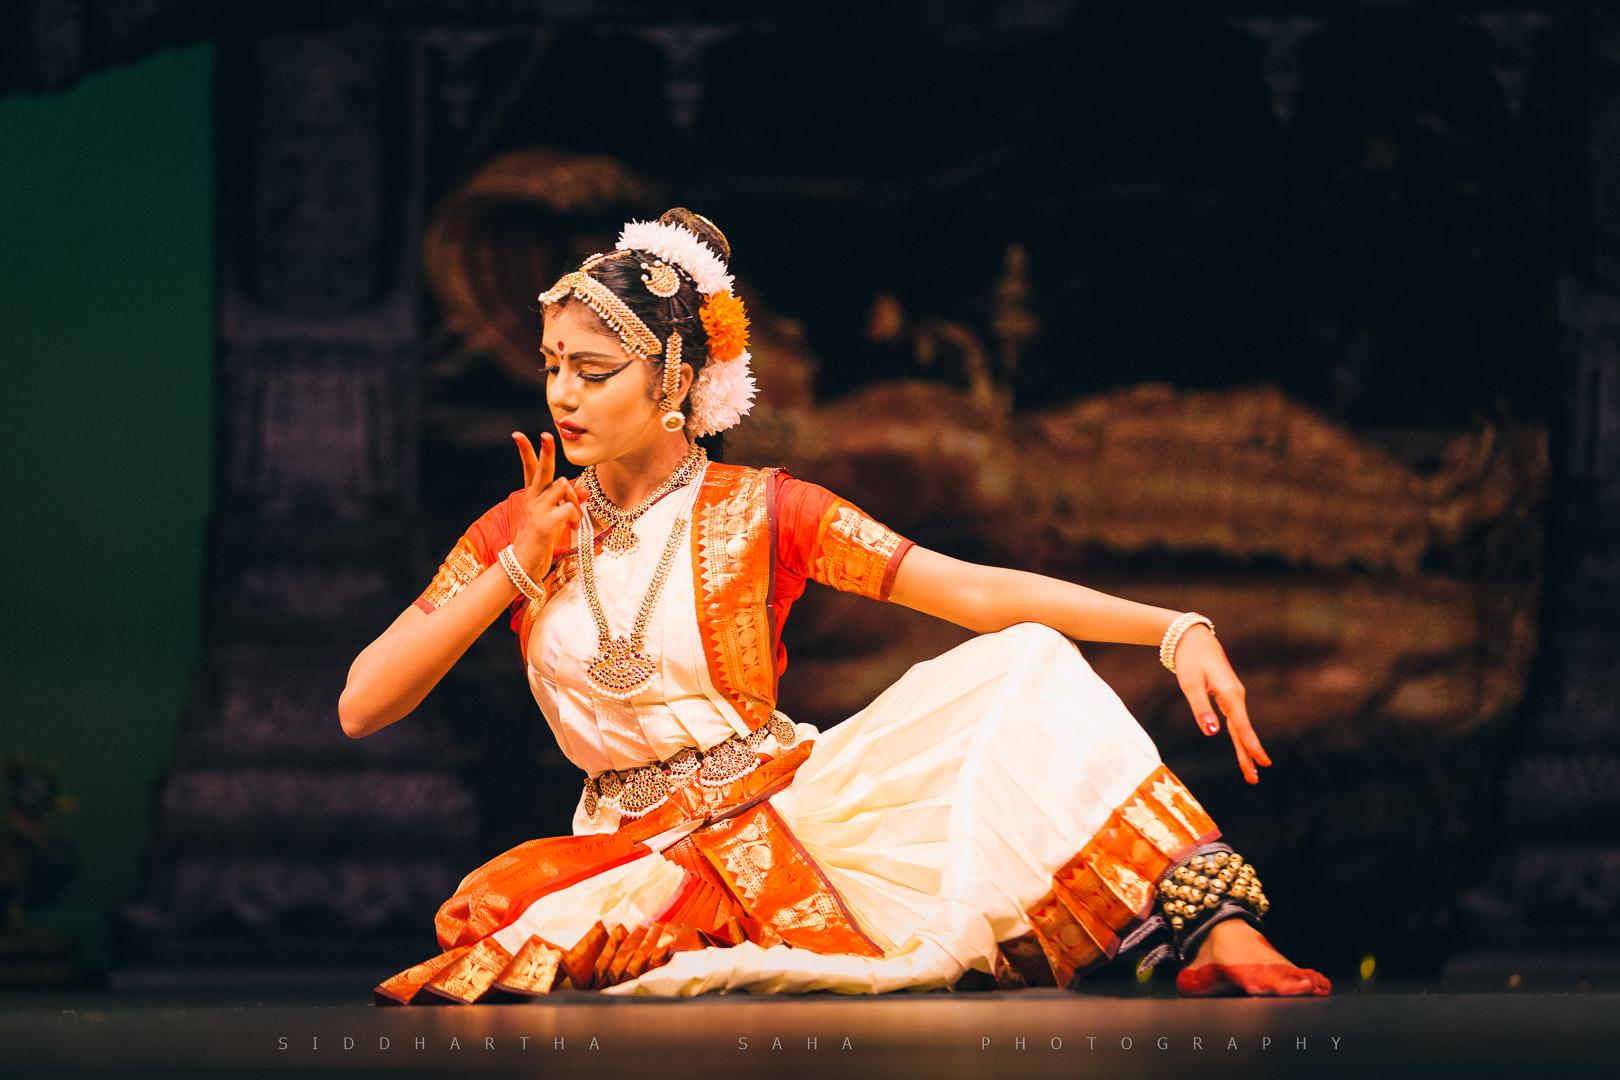 2015-07-25 - Kamaniya's Arangetram - _05Y6007